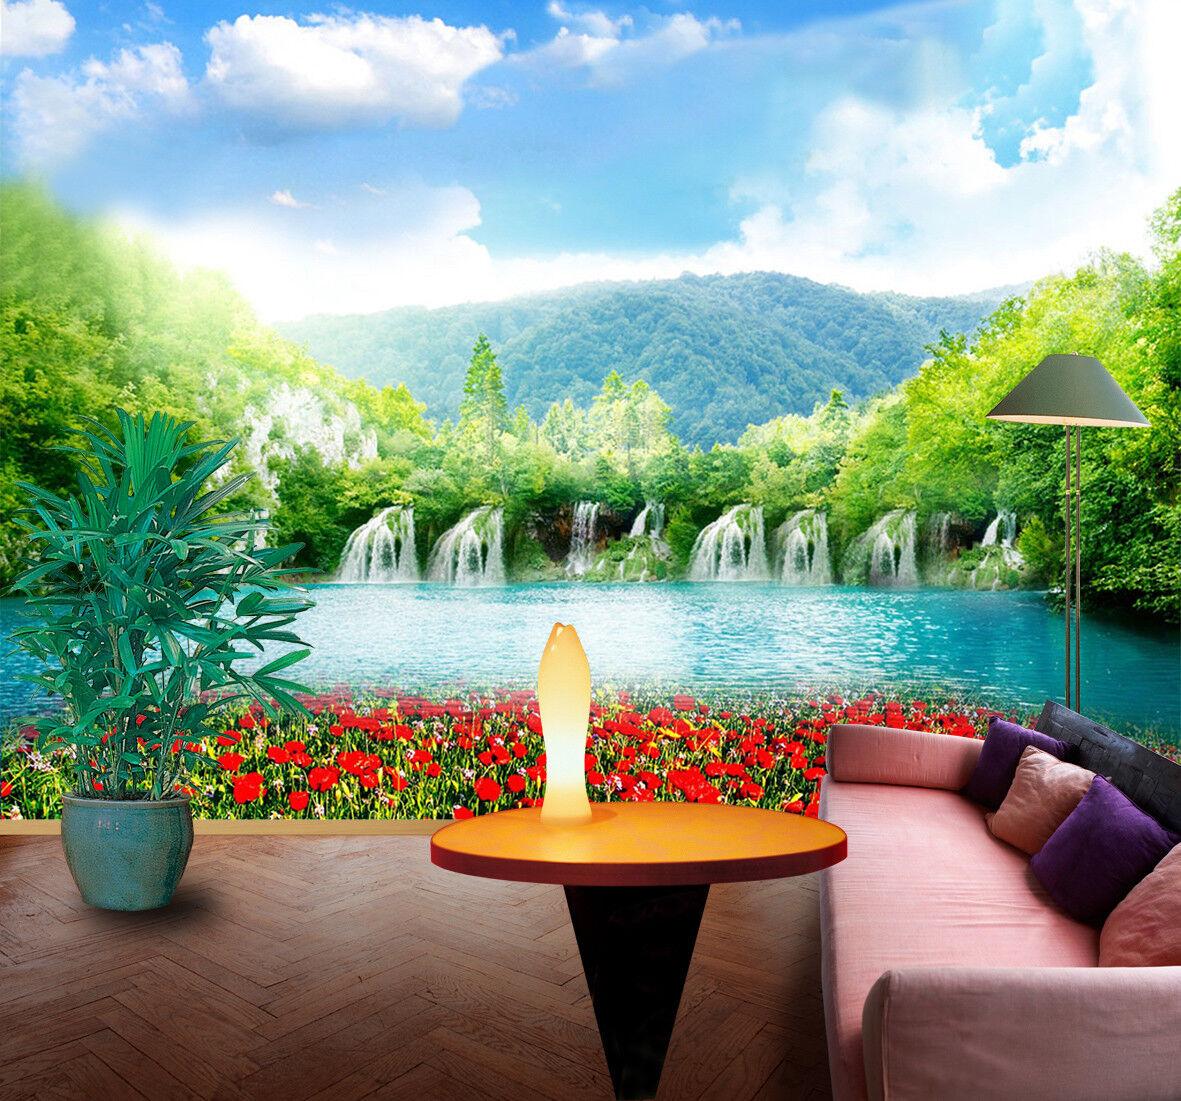 3D Fließender See Himmel 7683 Tapete Wandgemälde Tapeten Bild Familie DE Jenny | Moderne und stilvolle Mode  | New Listing  | Quality First